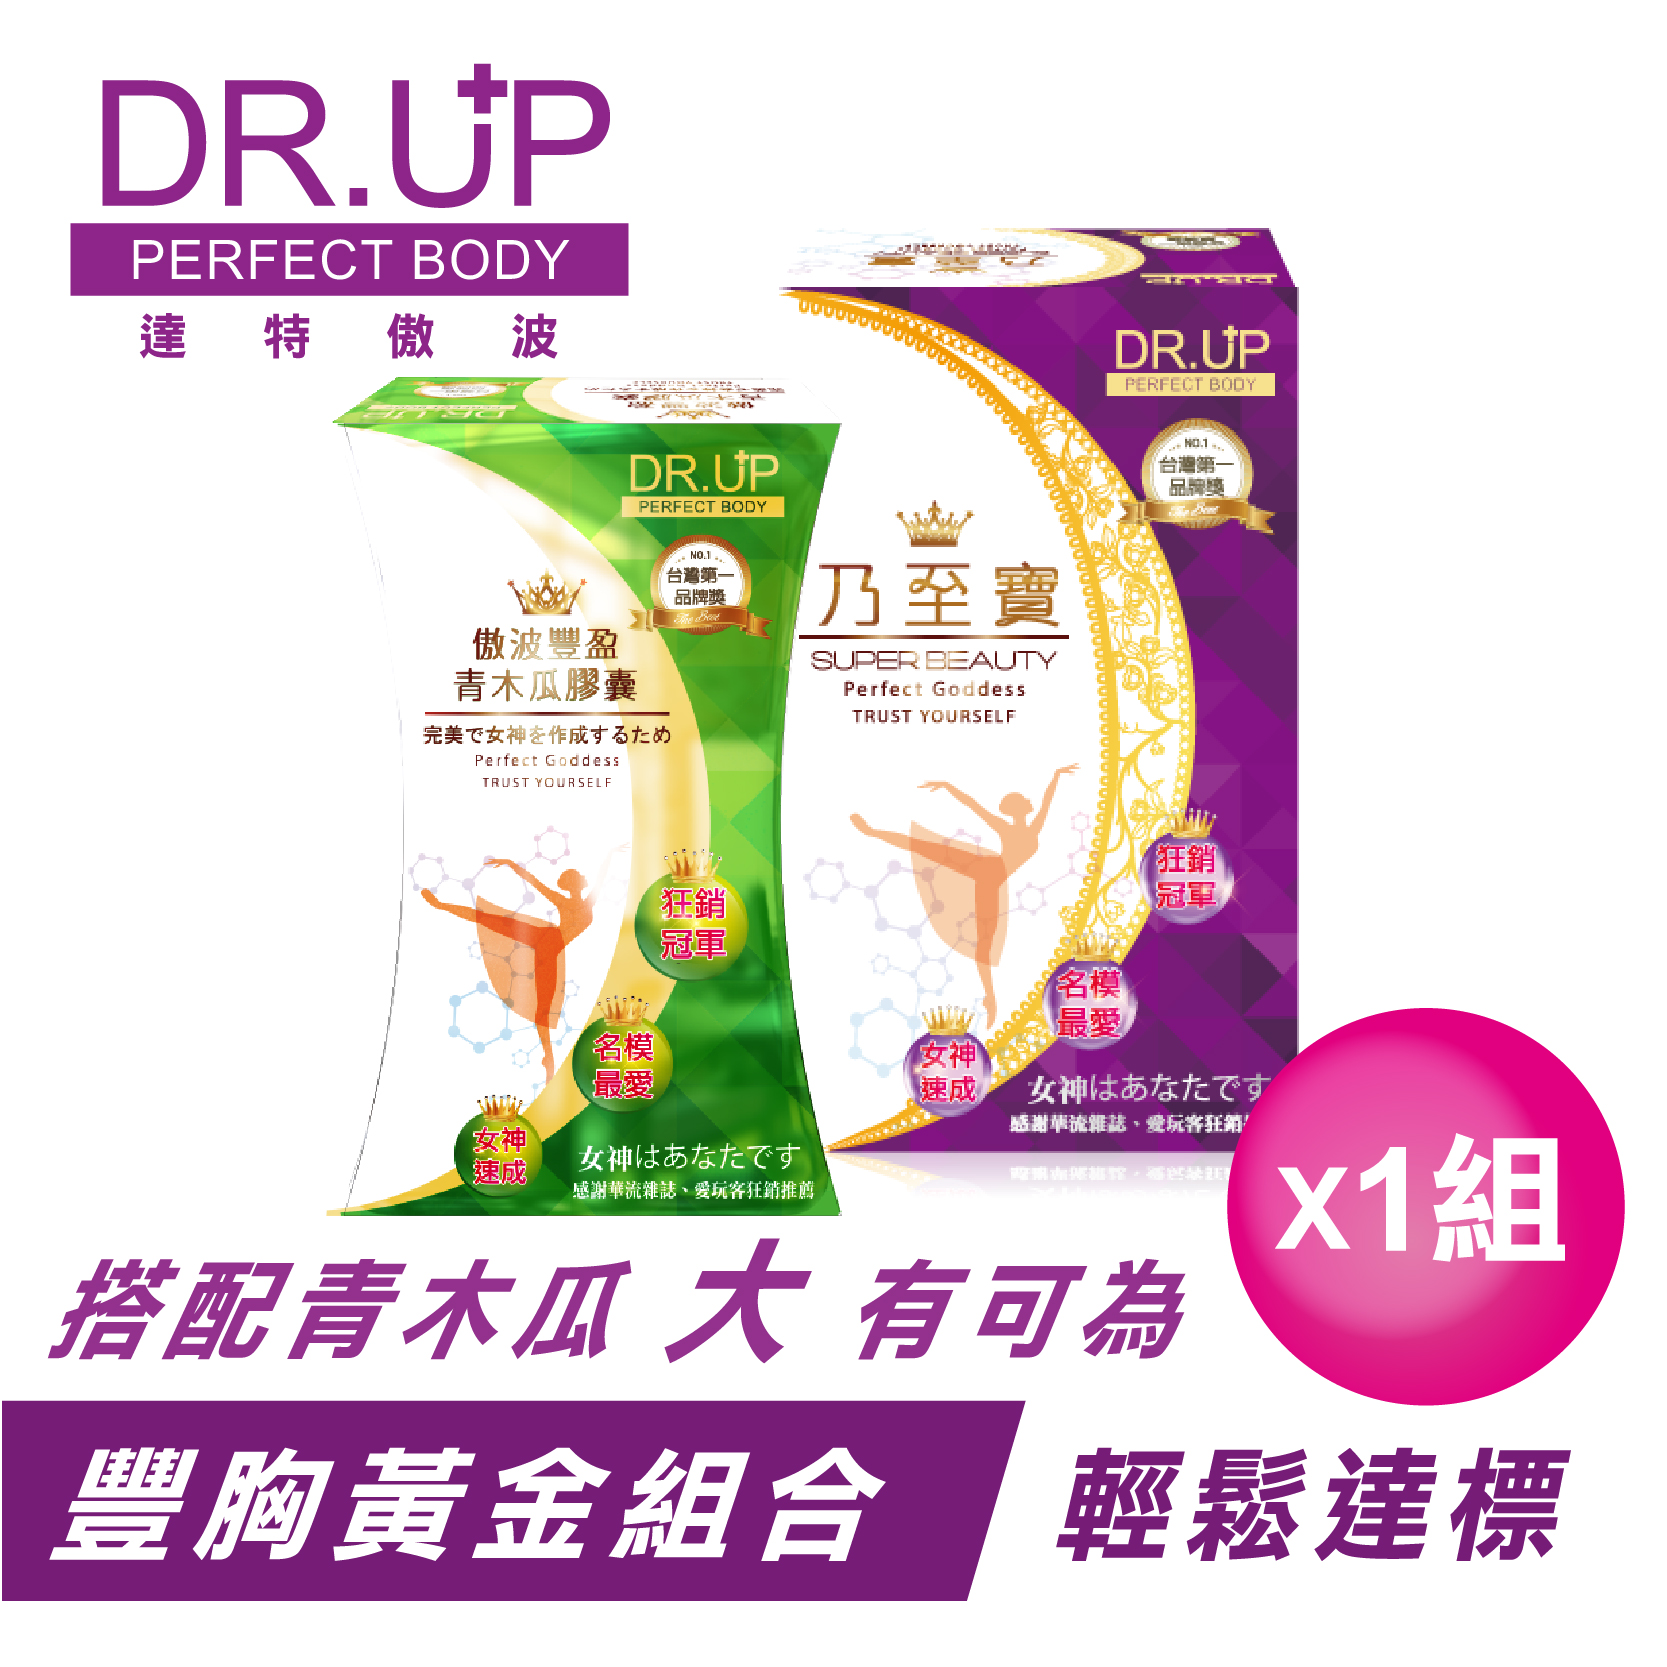 【DR.UP】乃至寶特濃第二代+特濃青木瓜豐盈膠囊